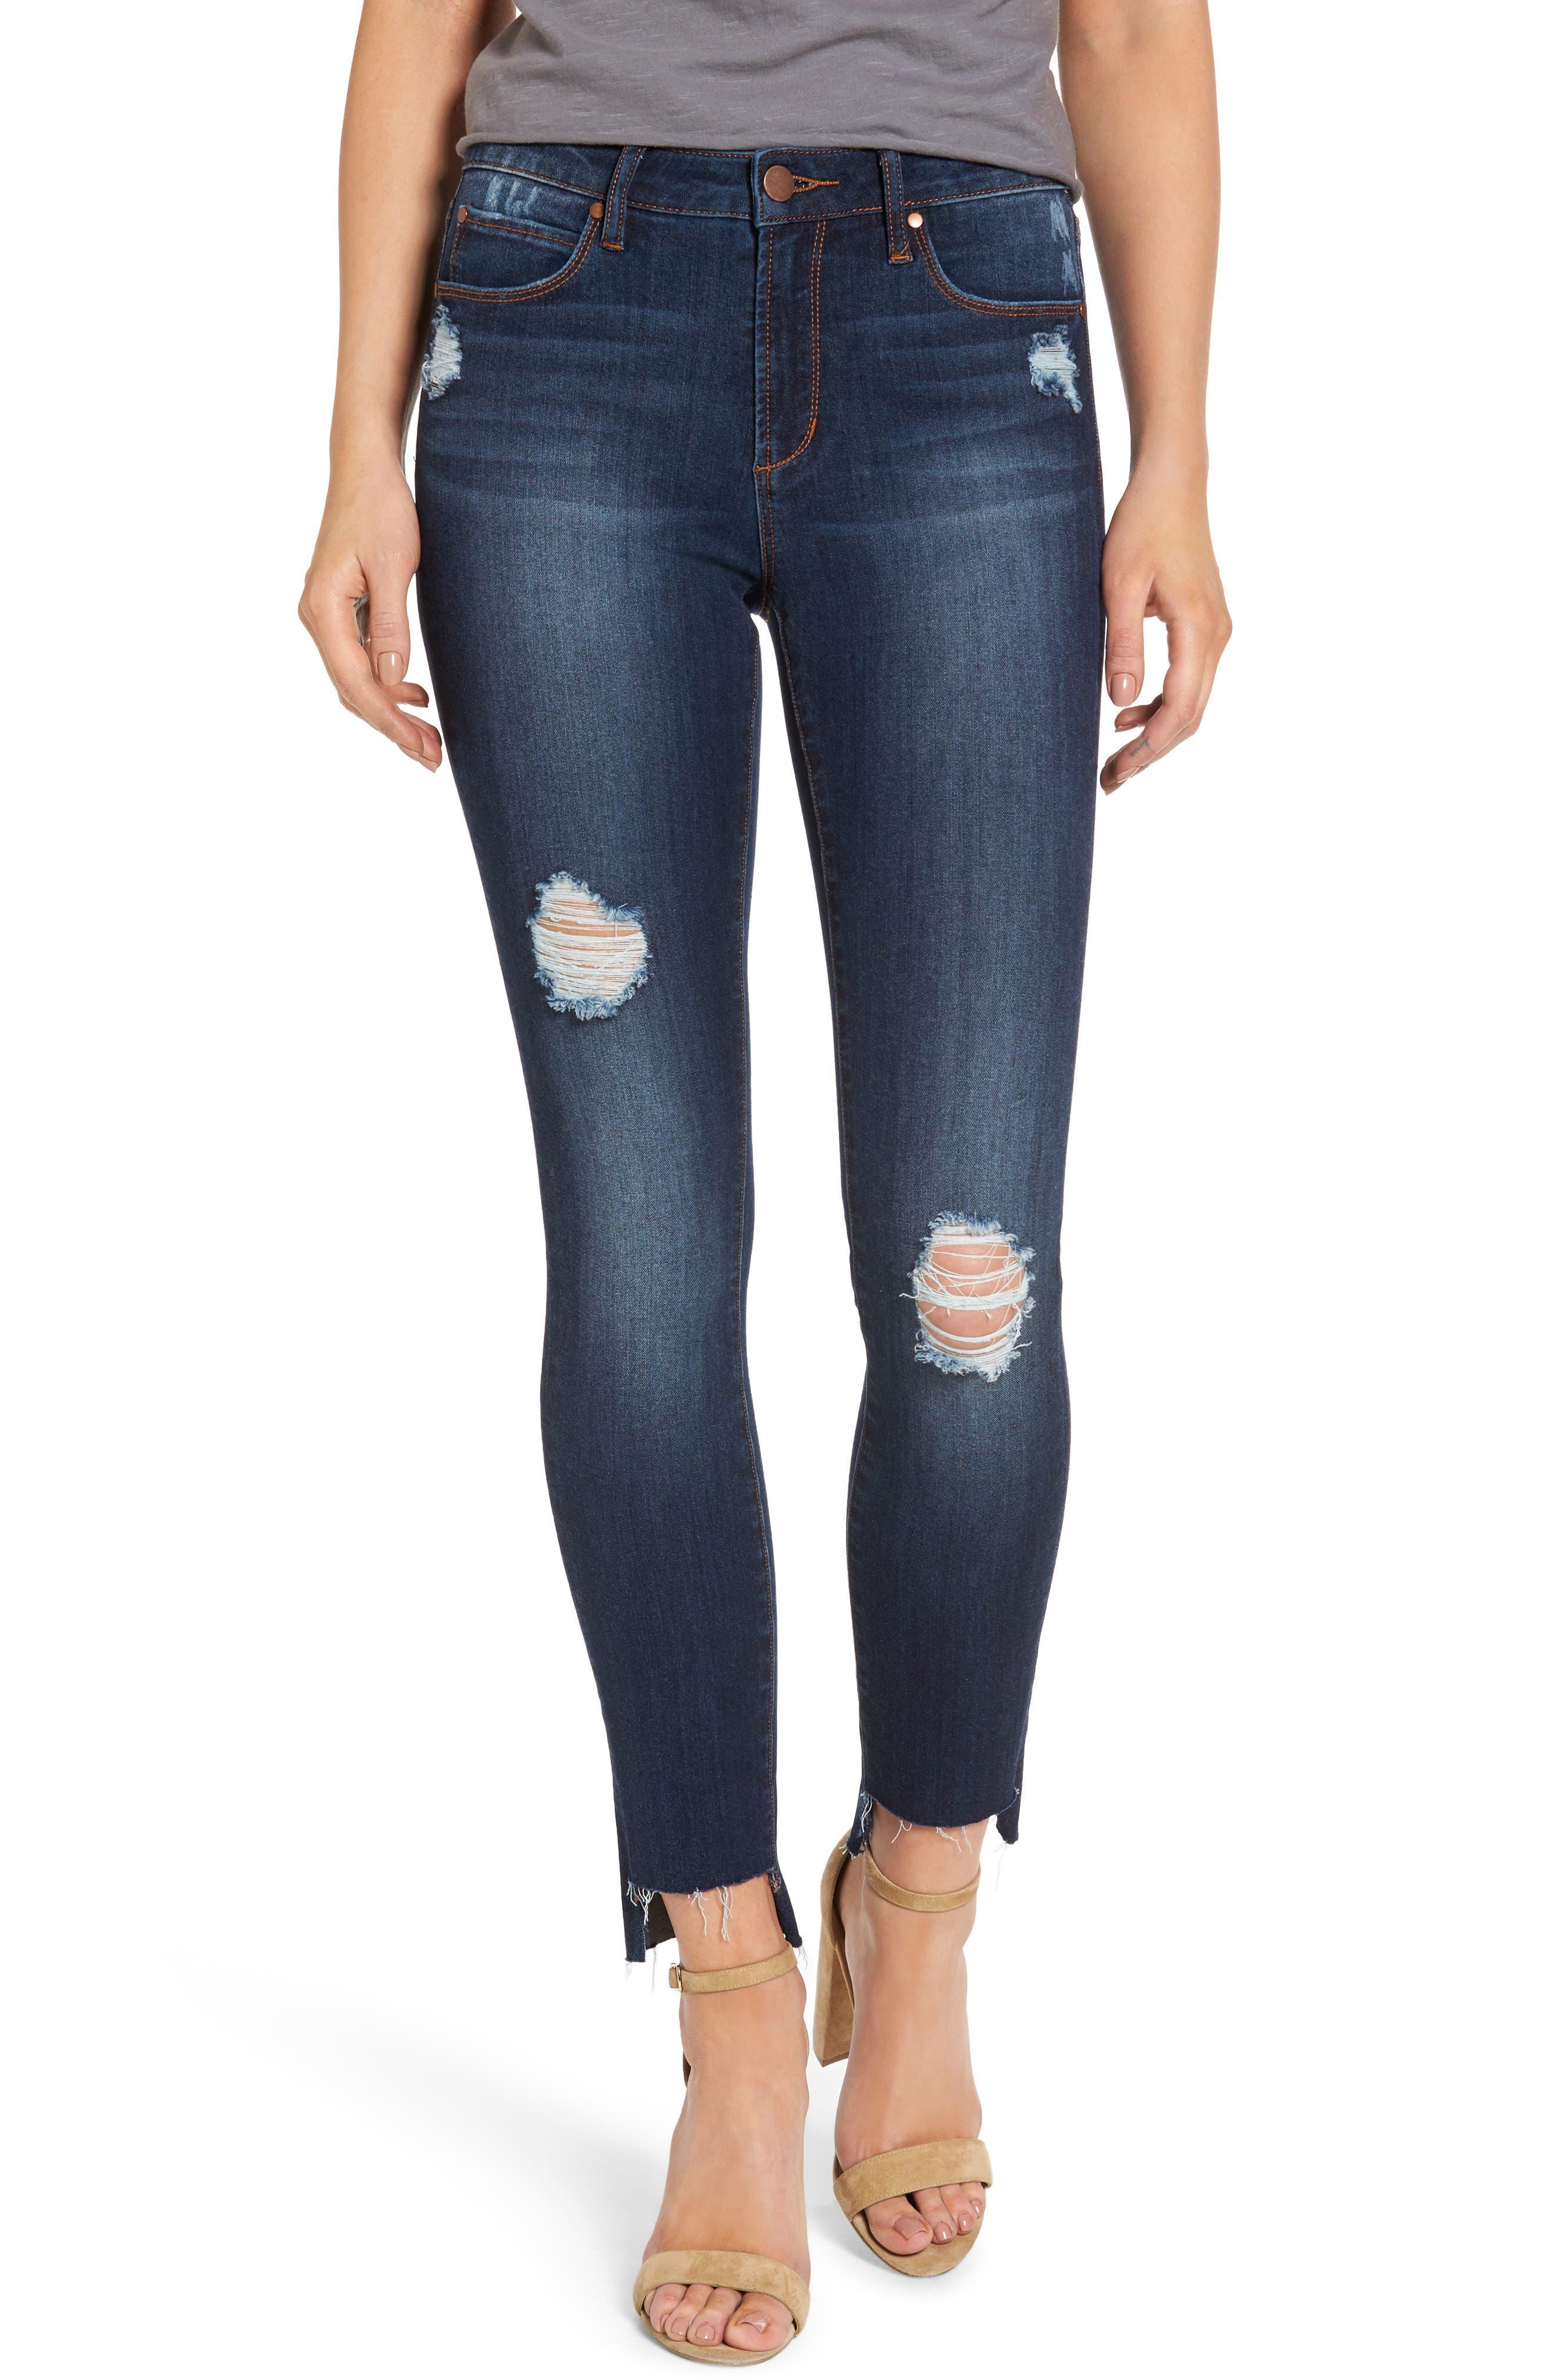 Main Image - Leith Ripped Step Hem Skinny Jeans (Destroy Medium)